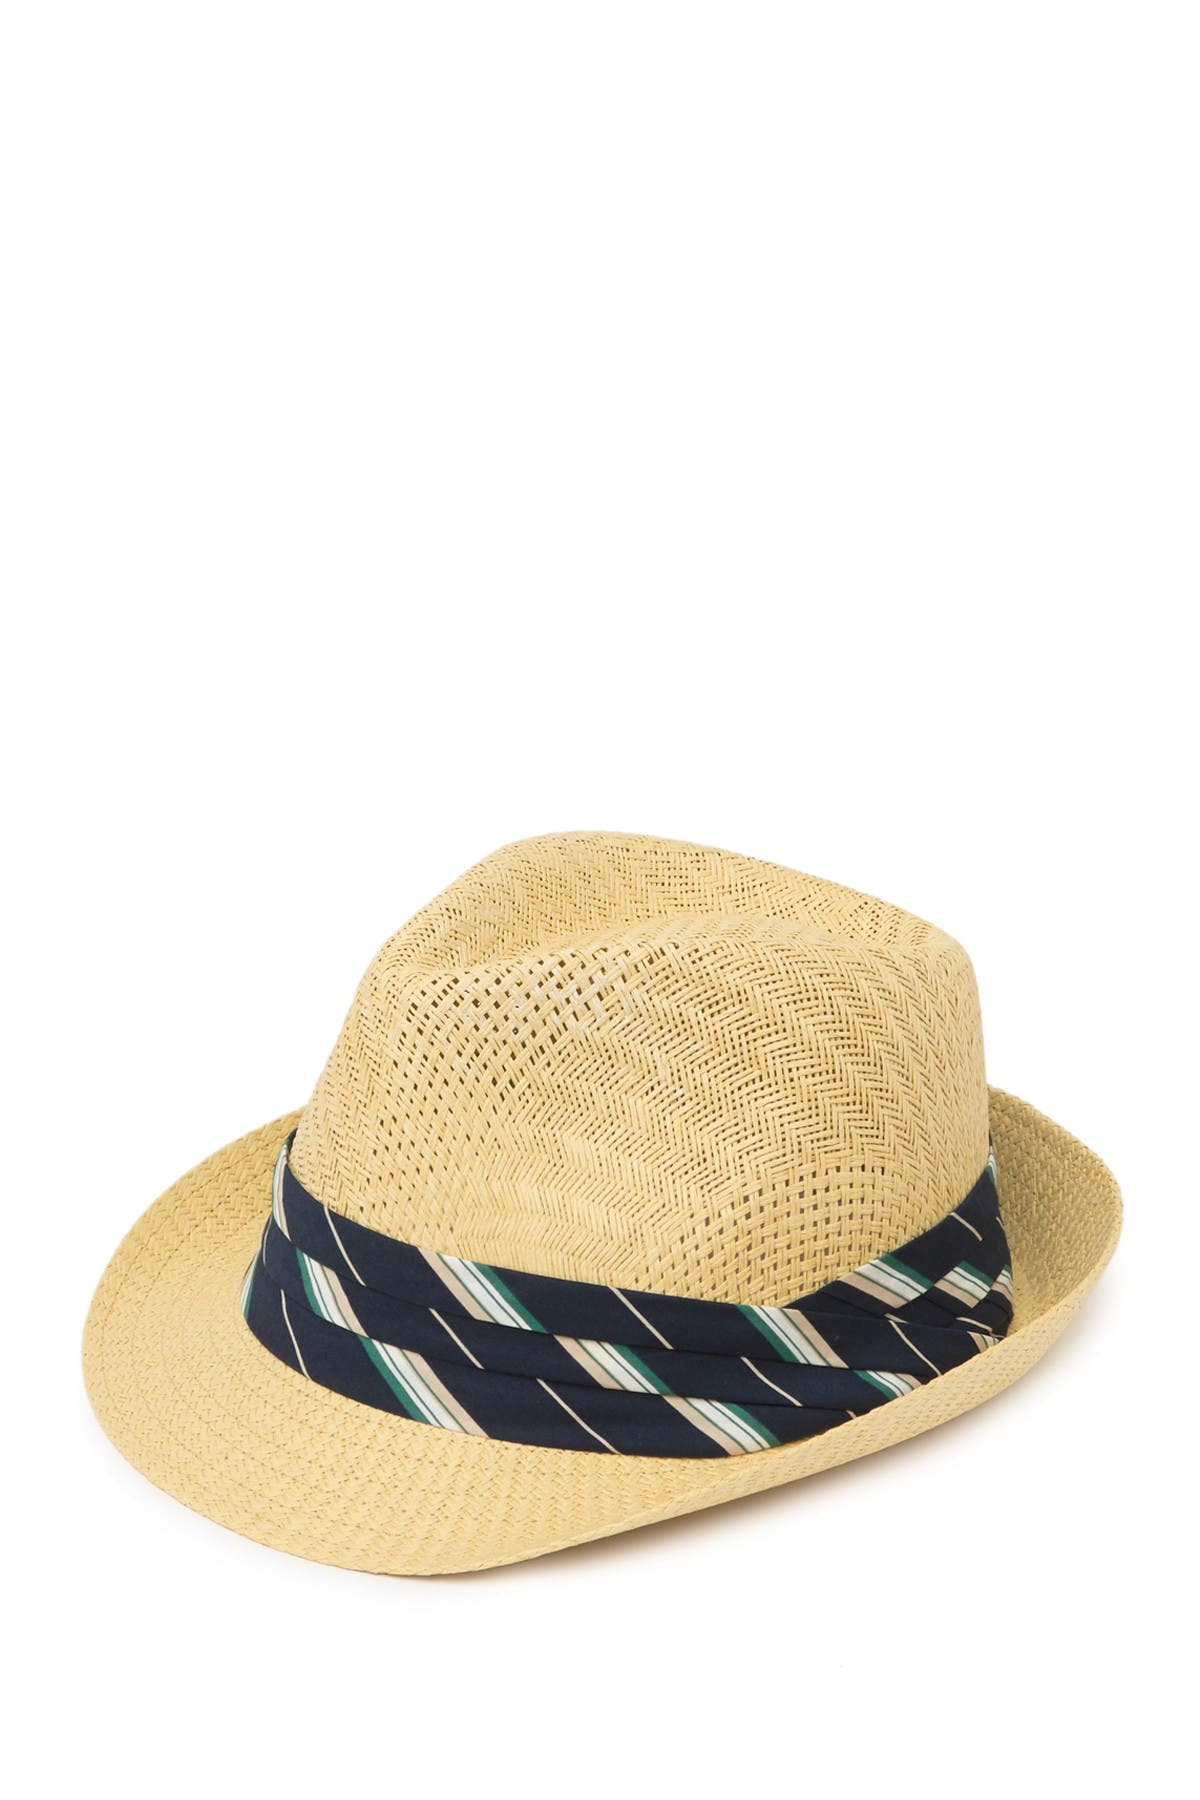 Image of SAN DIEGO HAT Pleated Striped Trim Fedora Hat